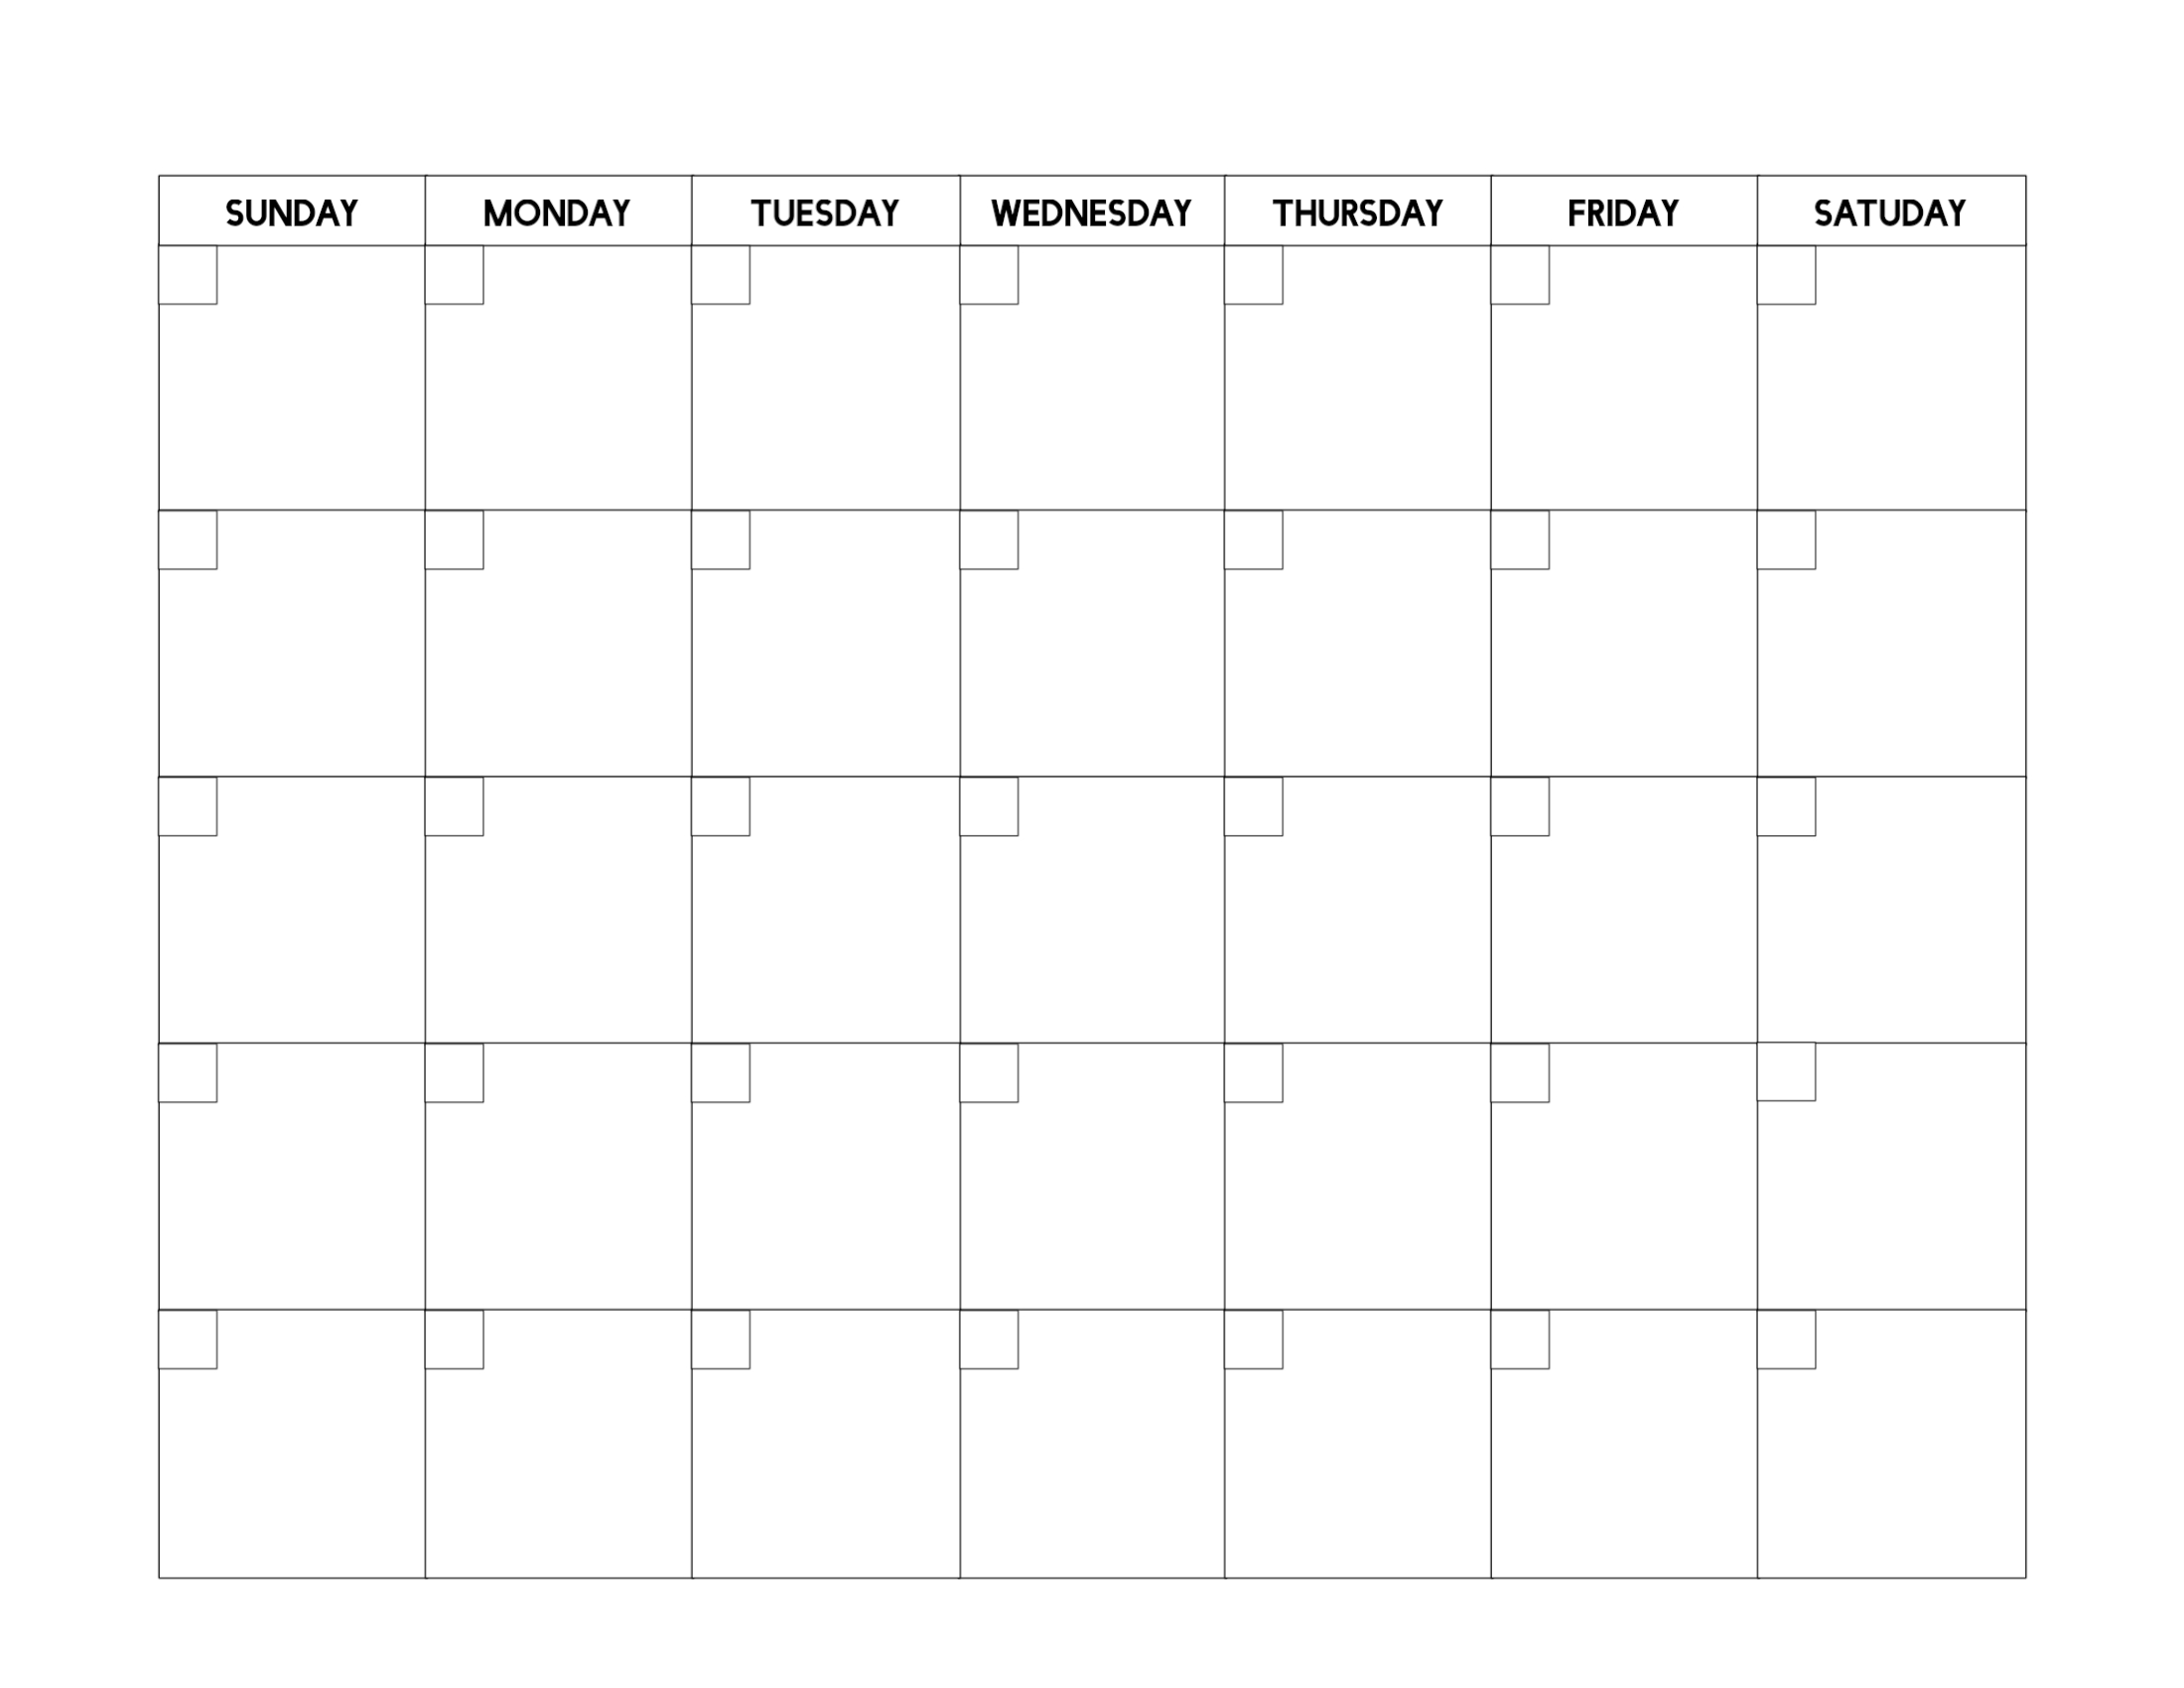 Free Printable Blank Calendar Template - Paper Trail Design  Full Page Blank Calendar Printable